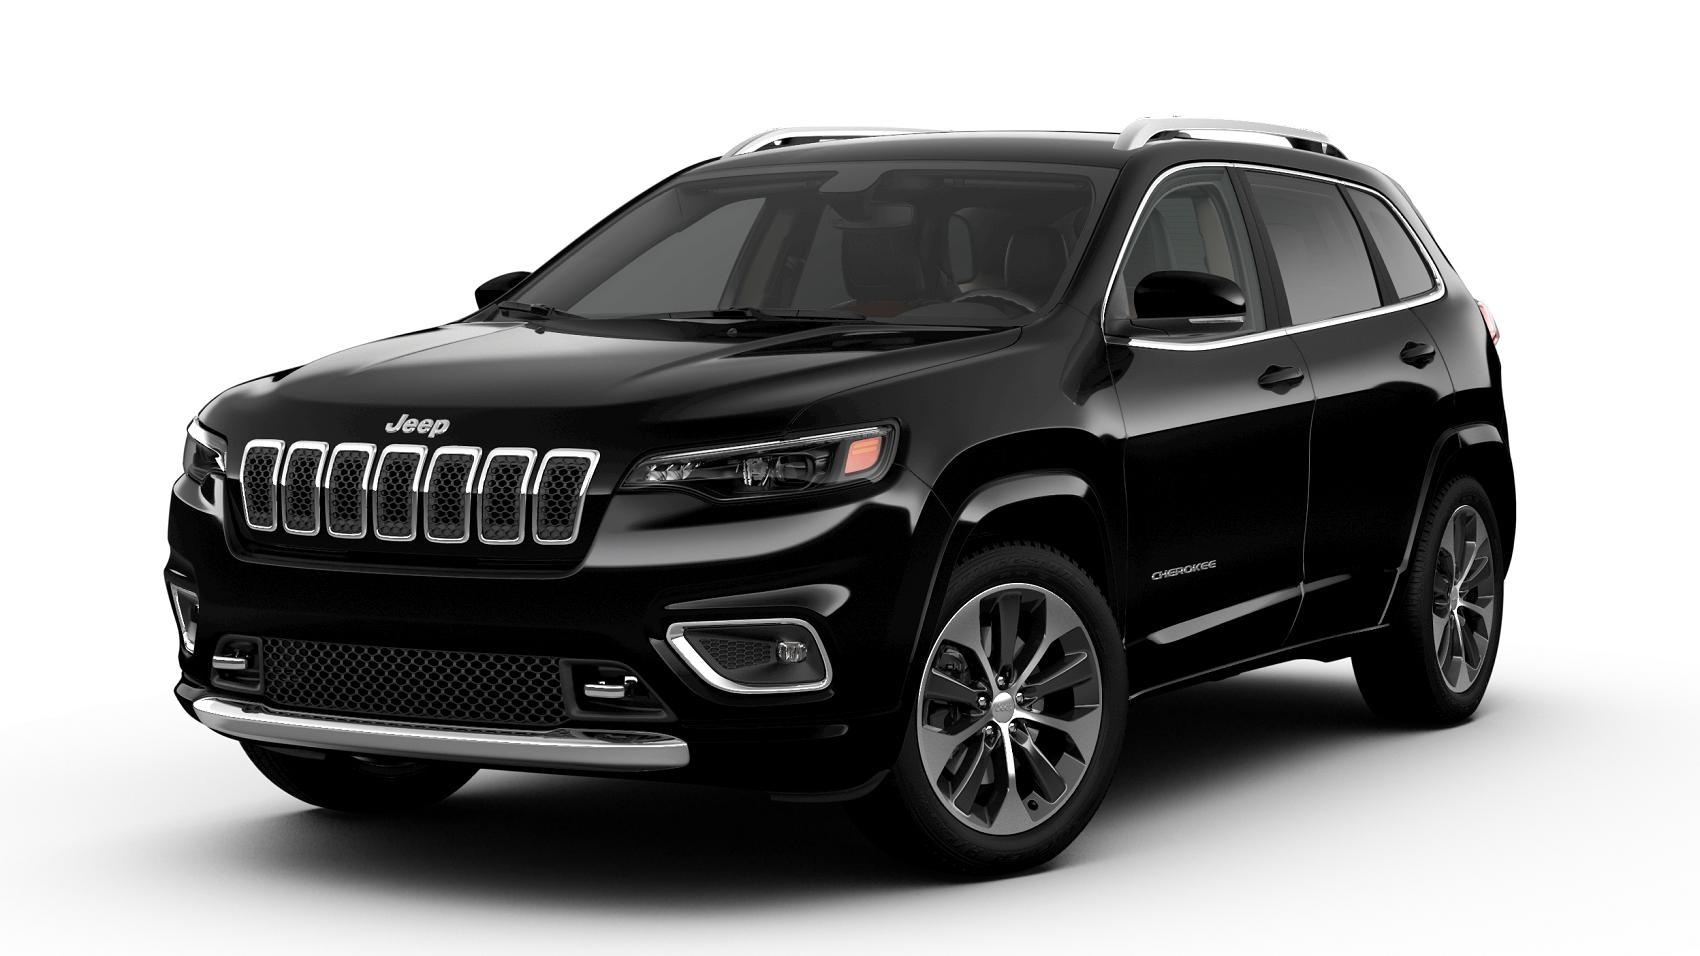 2020 Jeep Cherokee Overland FWD black jellybean